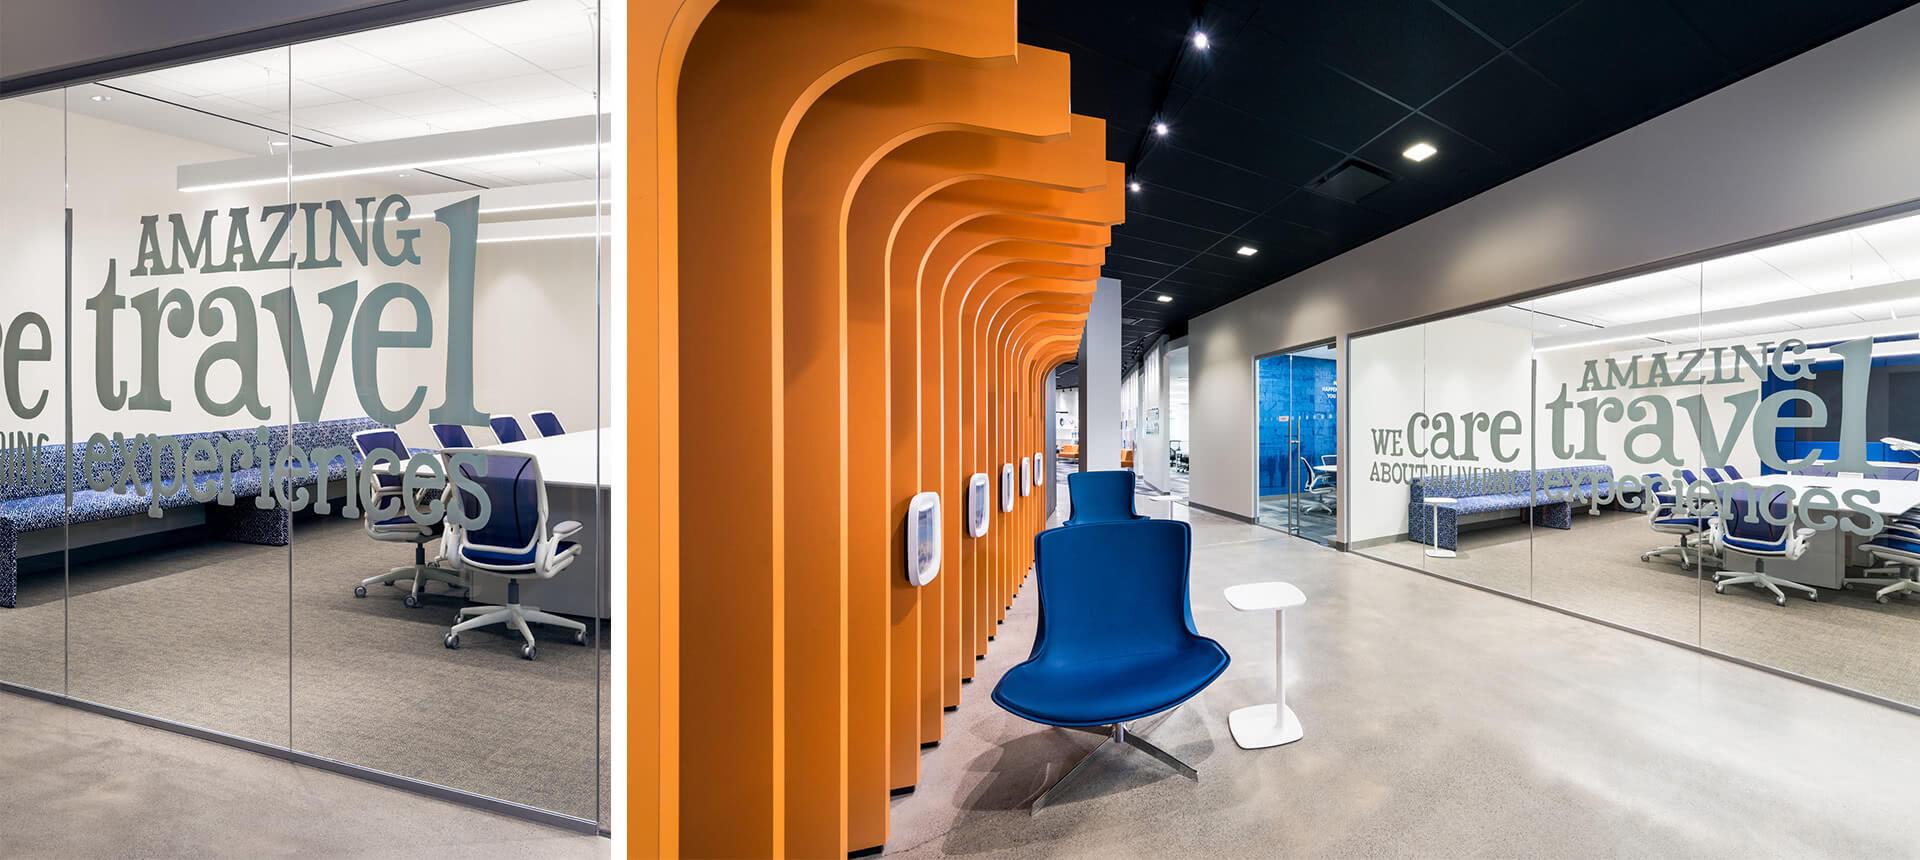 aol corporate office. FC USA, Inc. Liberty Travel New Corporate Headquarters Aol Office E